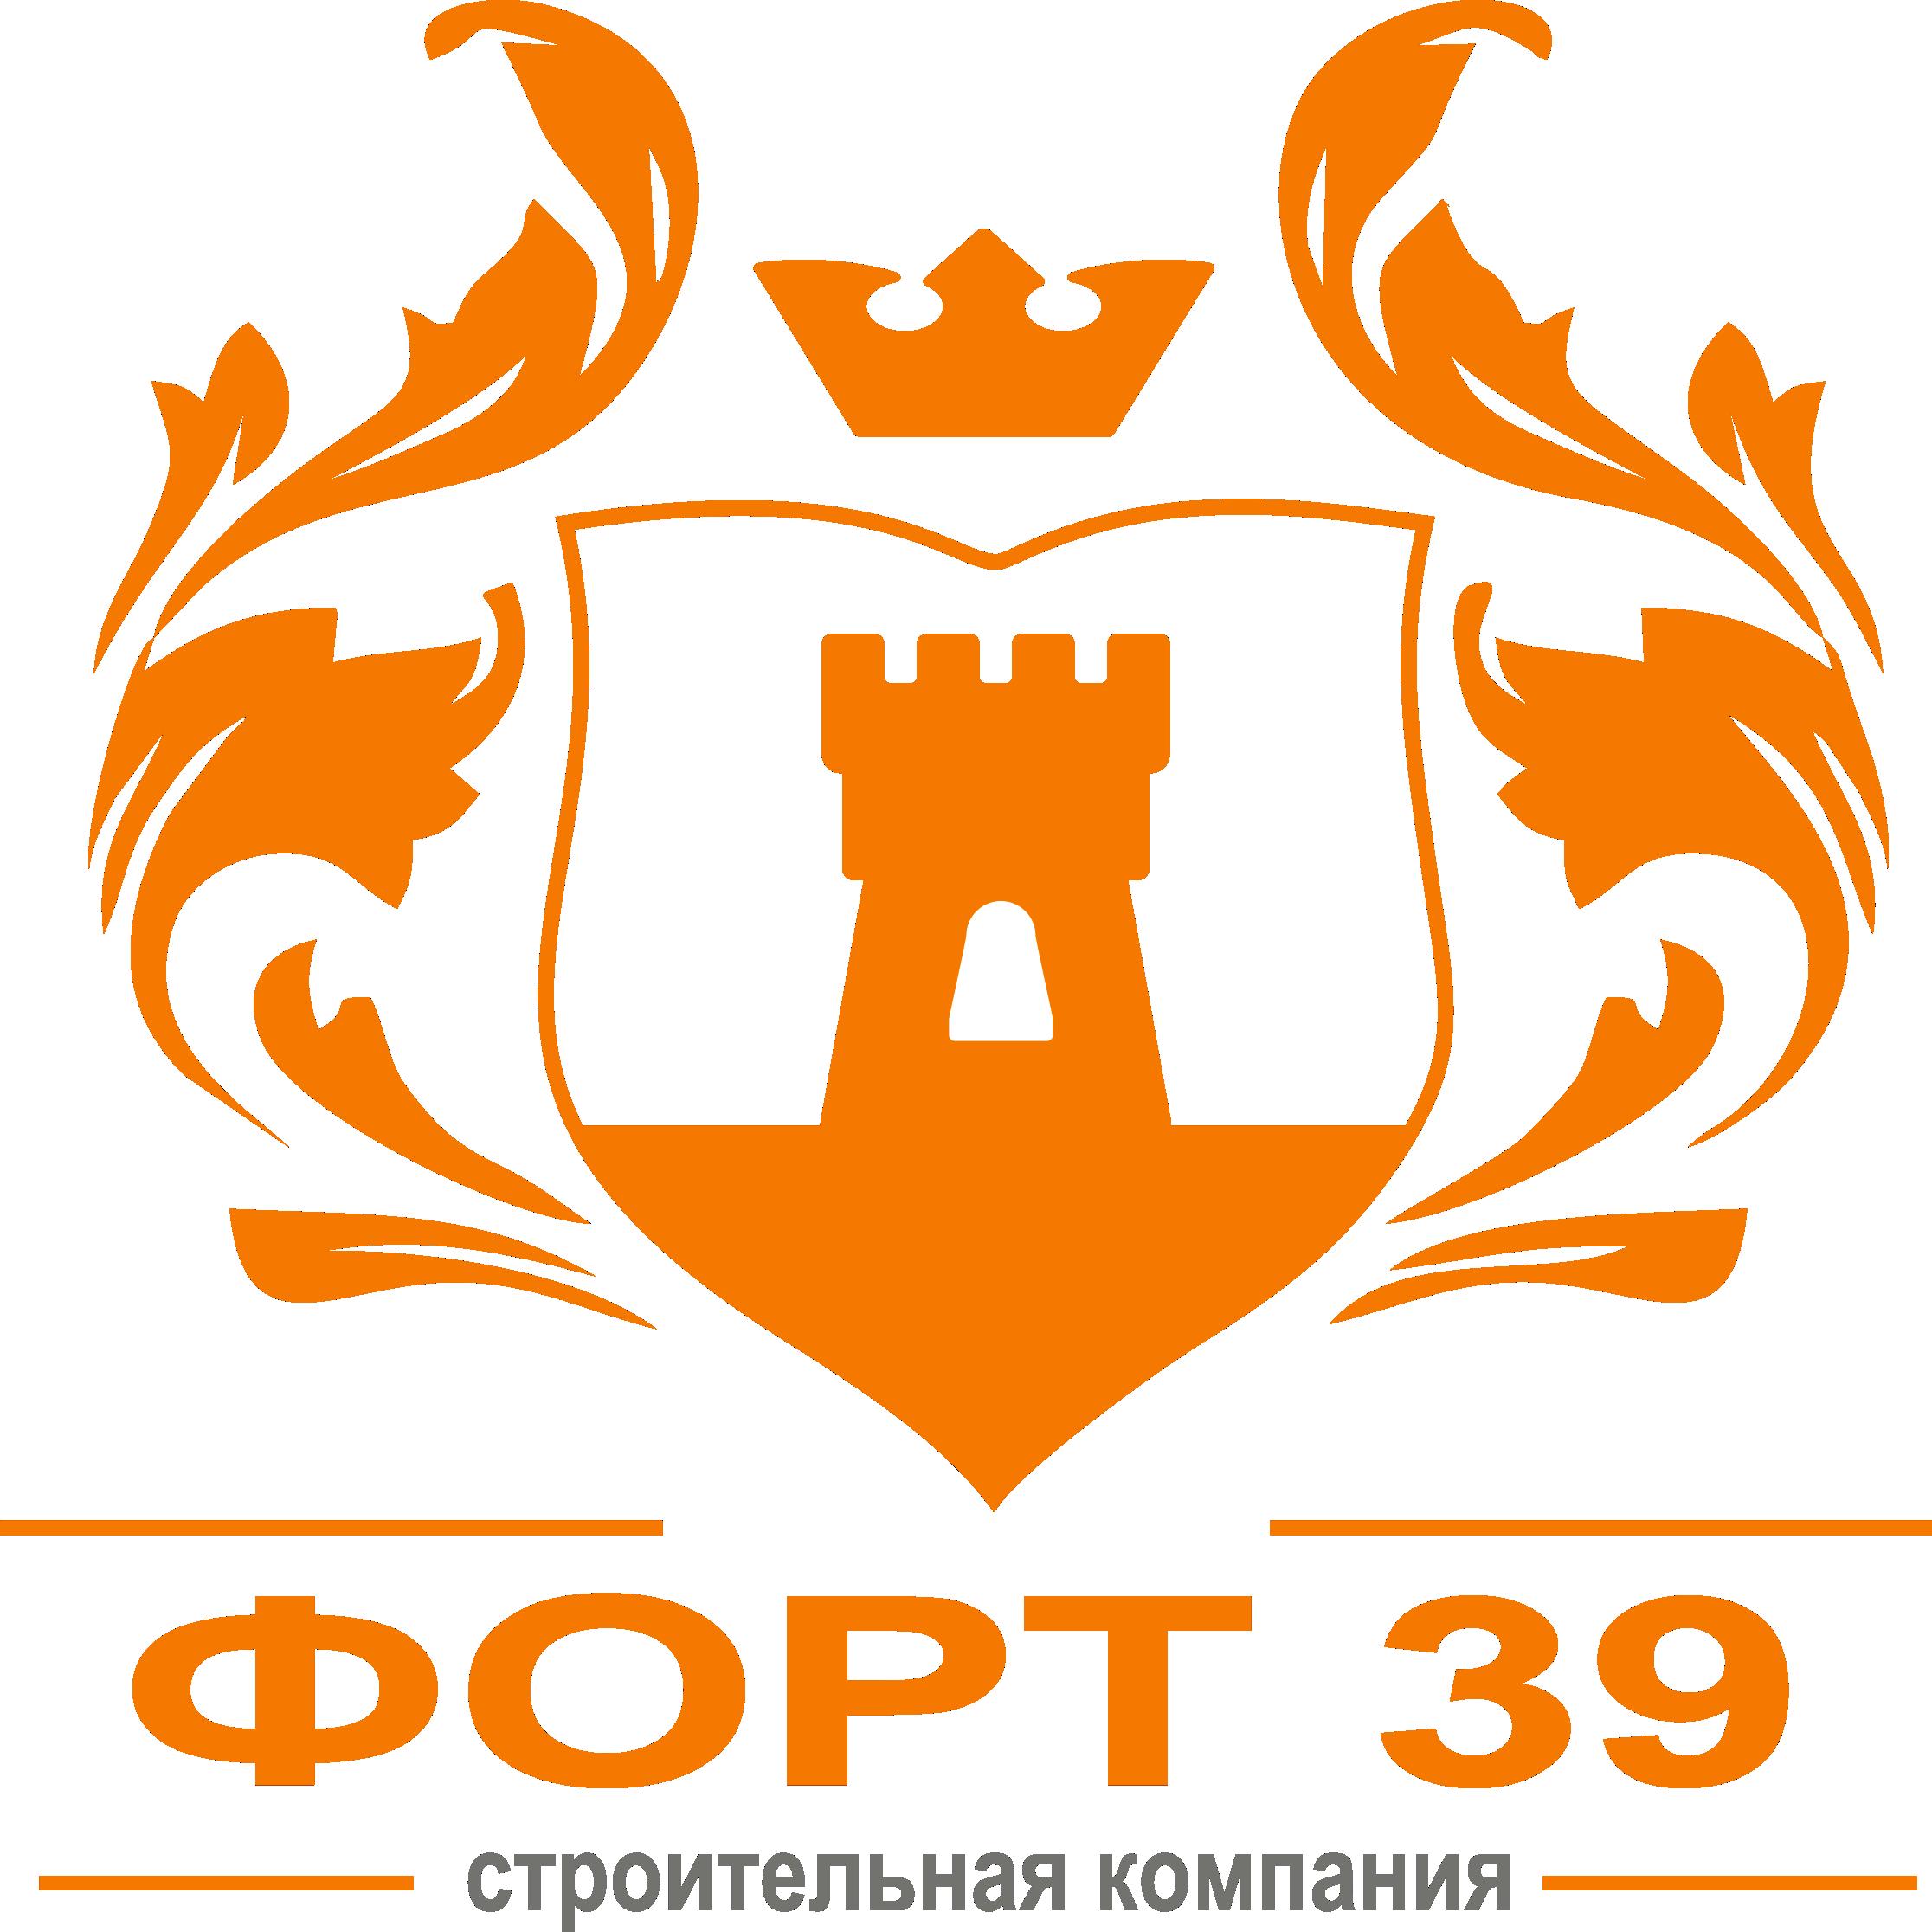 logo_fort-39_50f9.png?1566066897